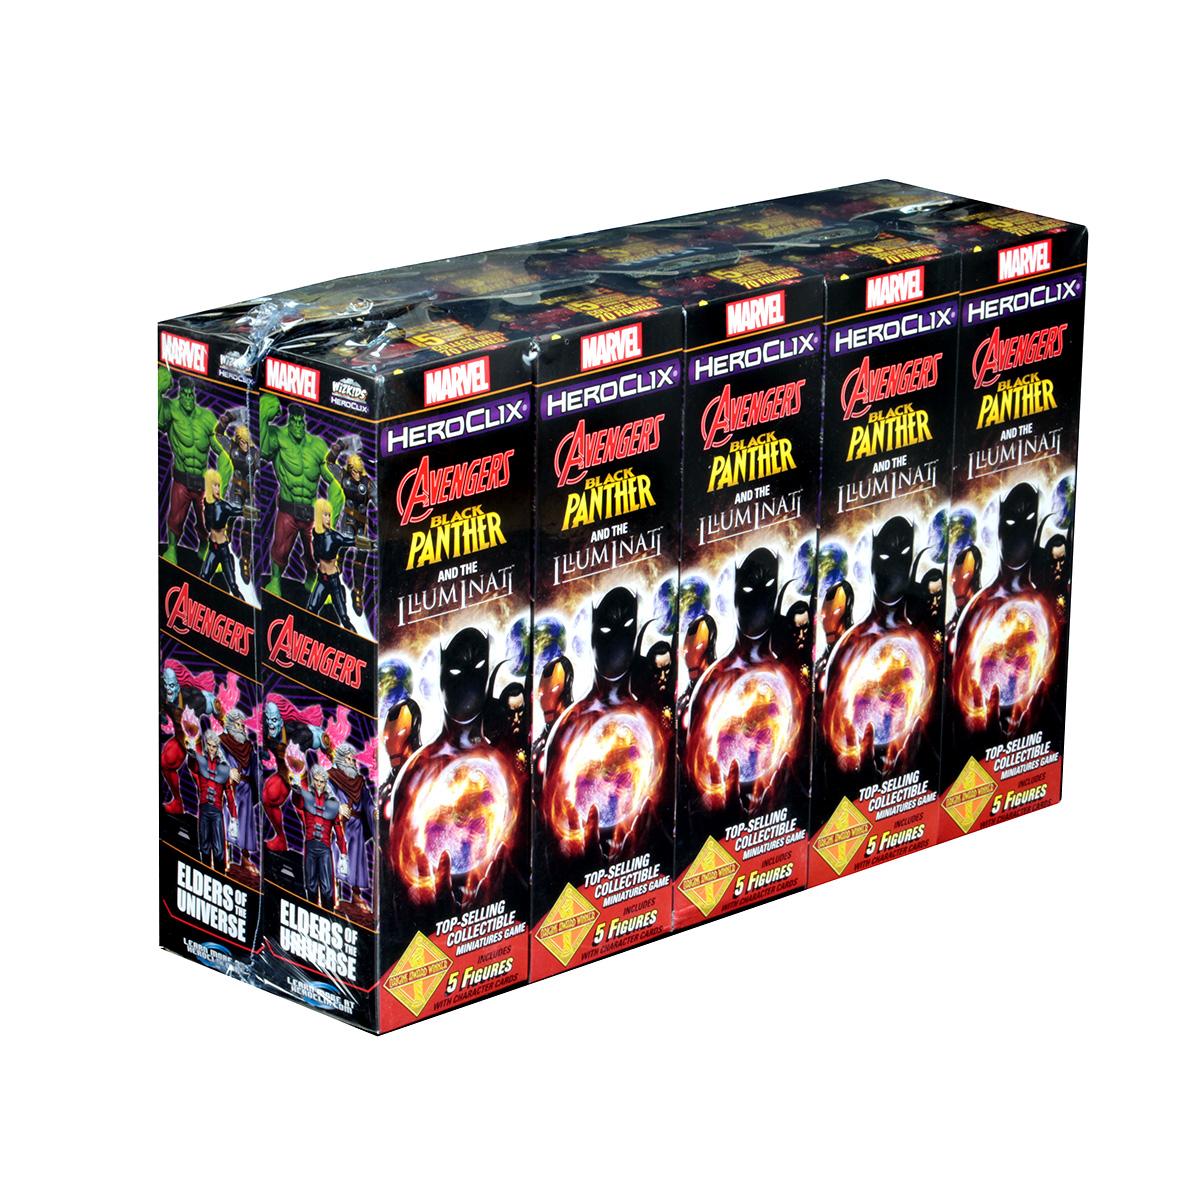 Heroclix Black Panther /& The Illuminati Booster Brick 10 ct. Token Pack